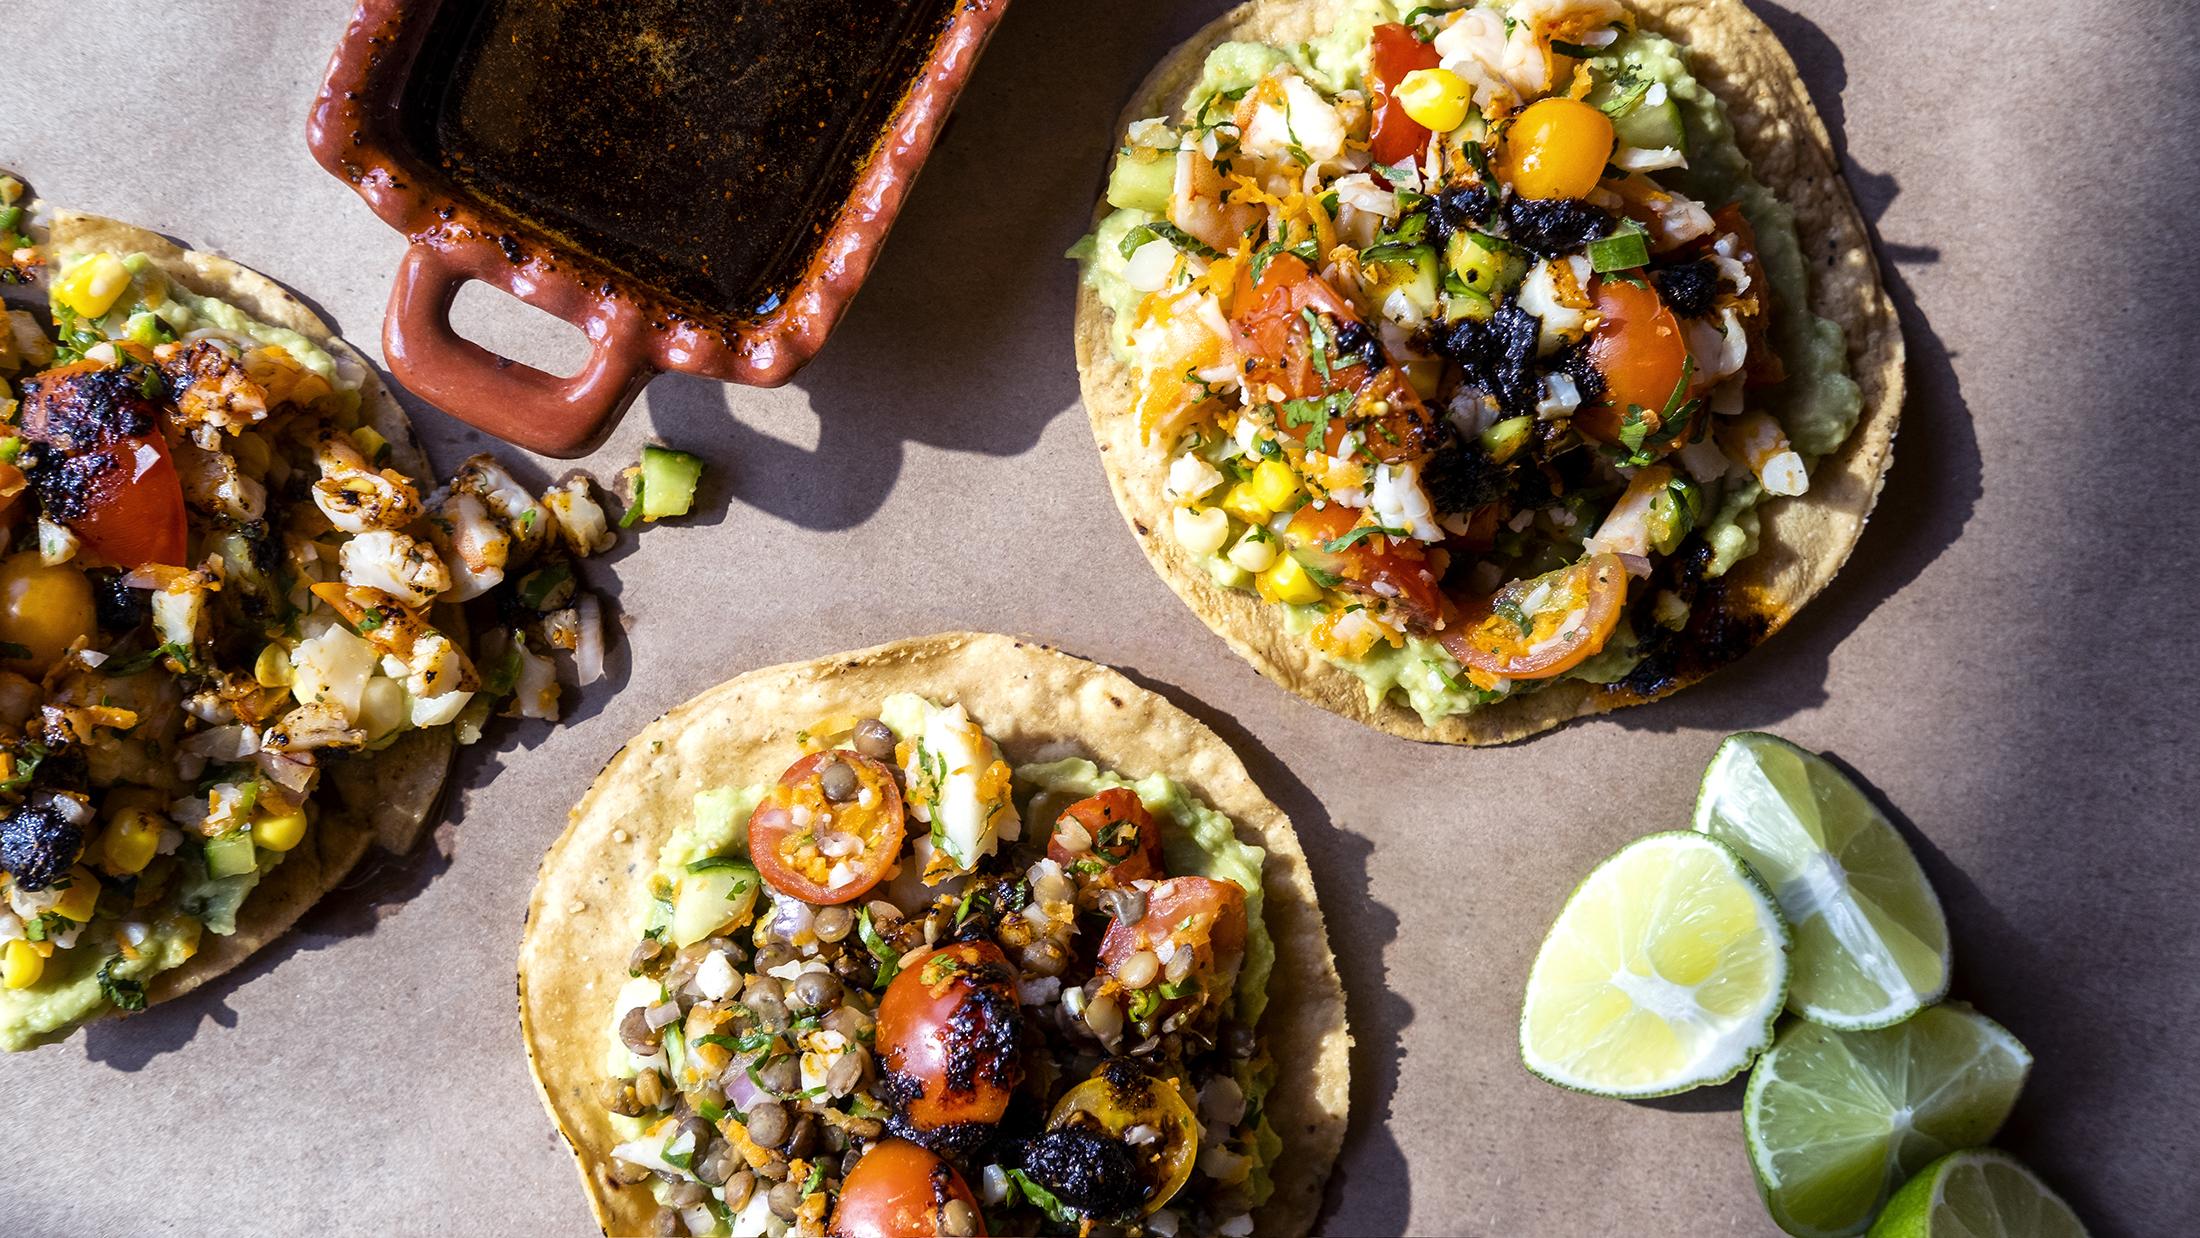 Ceviche Tostadas with Avocado & Salsa Macha from Executive Chef Reyna